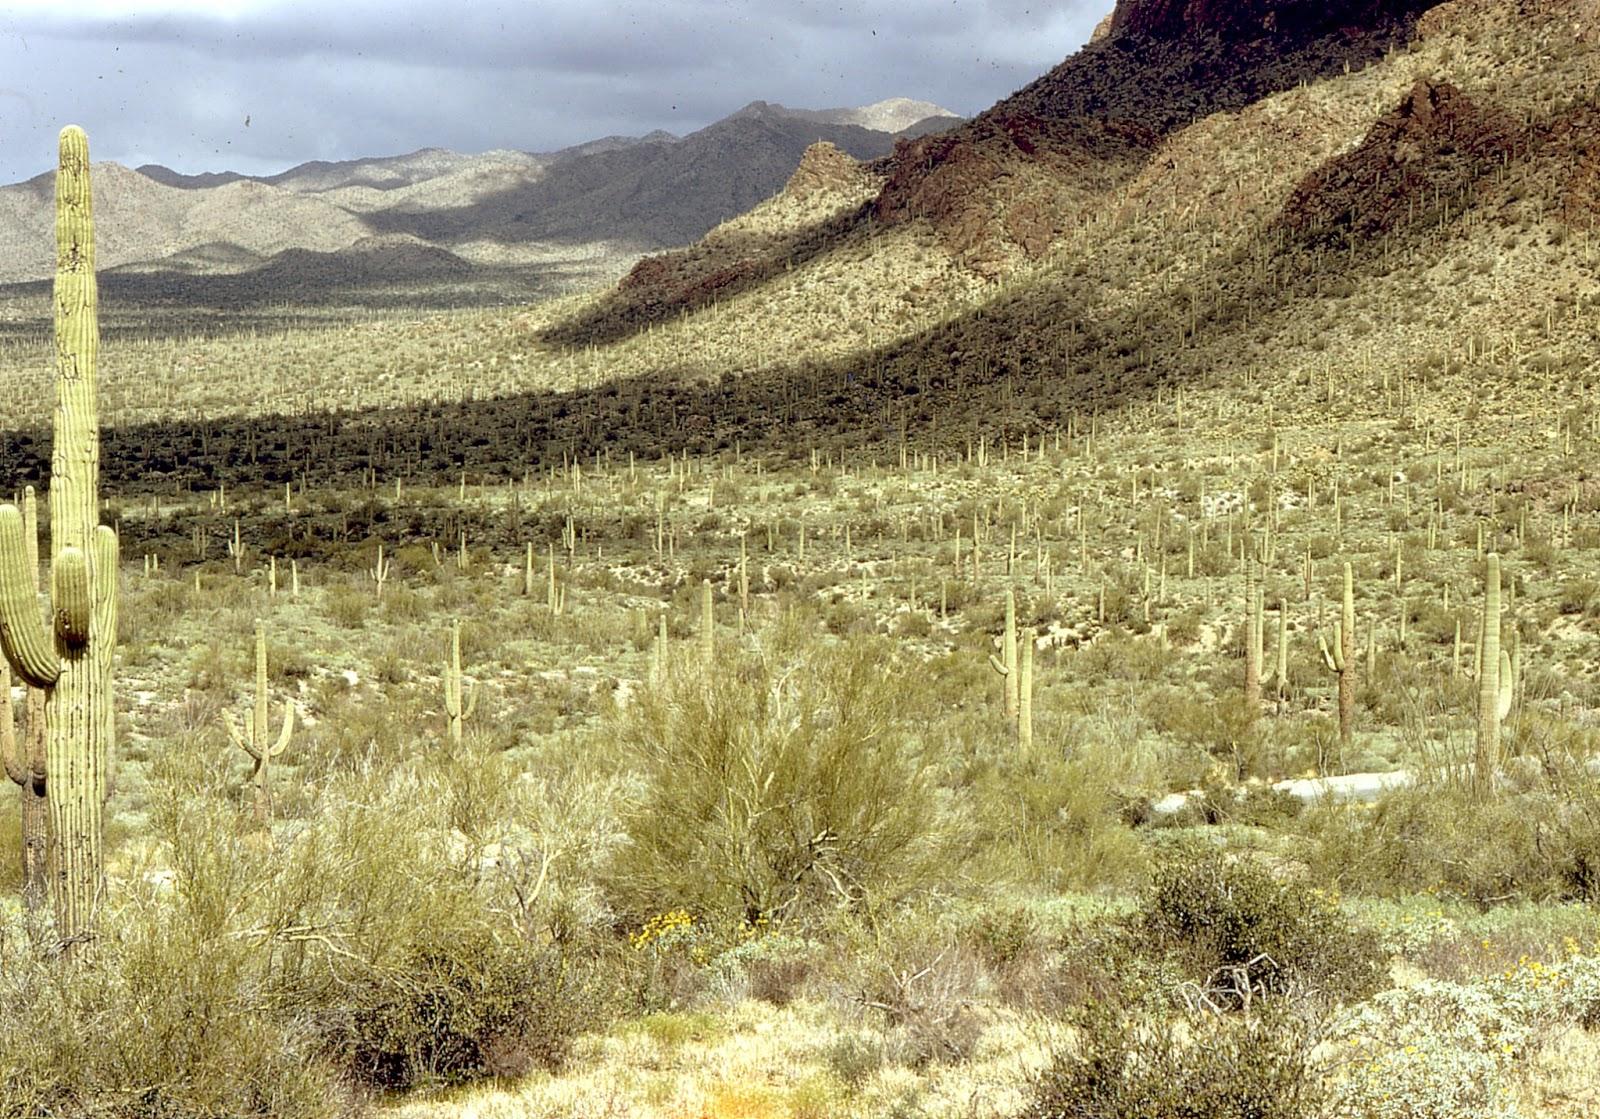 Dazzling Desert Adventures What Desert Should I Go To